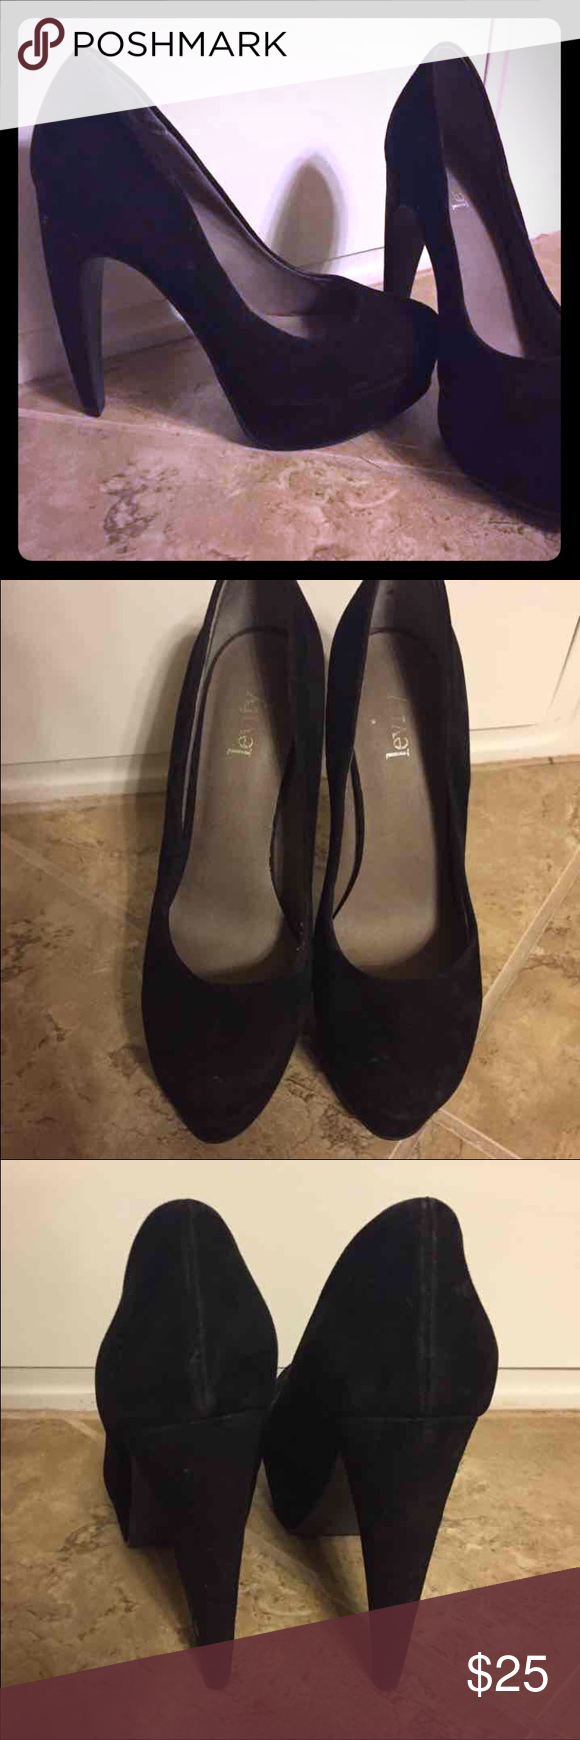 Size 7 Black stilettos 4.5 inch black velvet stilettos. Unique heal. Very cute. No visible signs of wear Shoes Heels